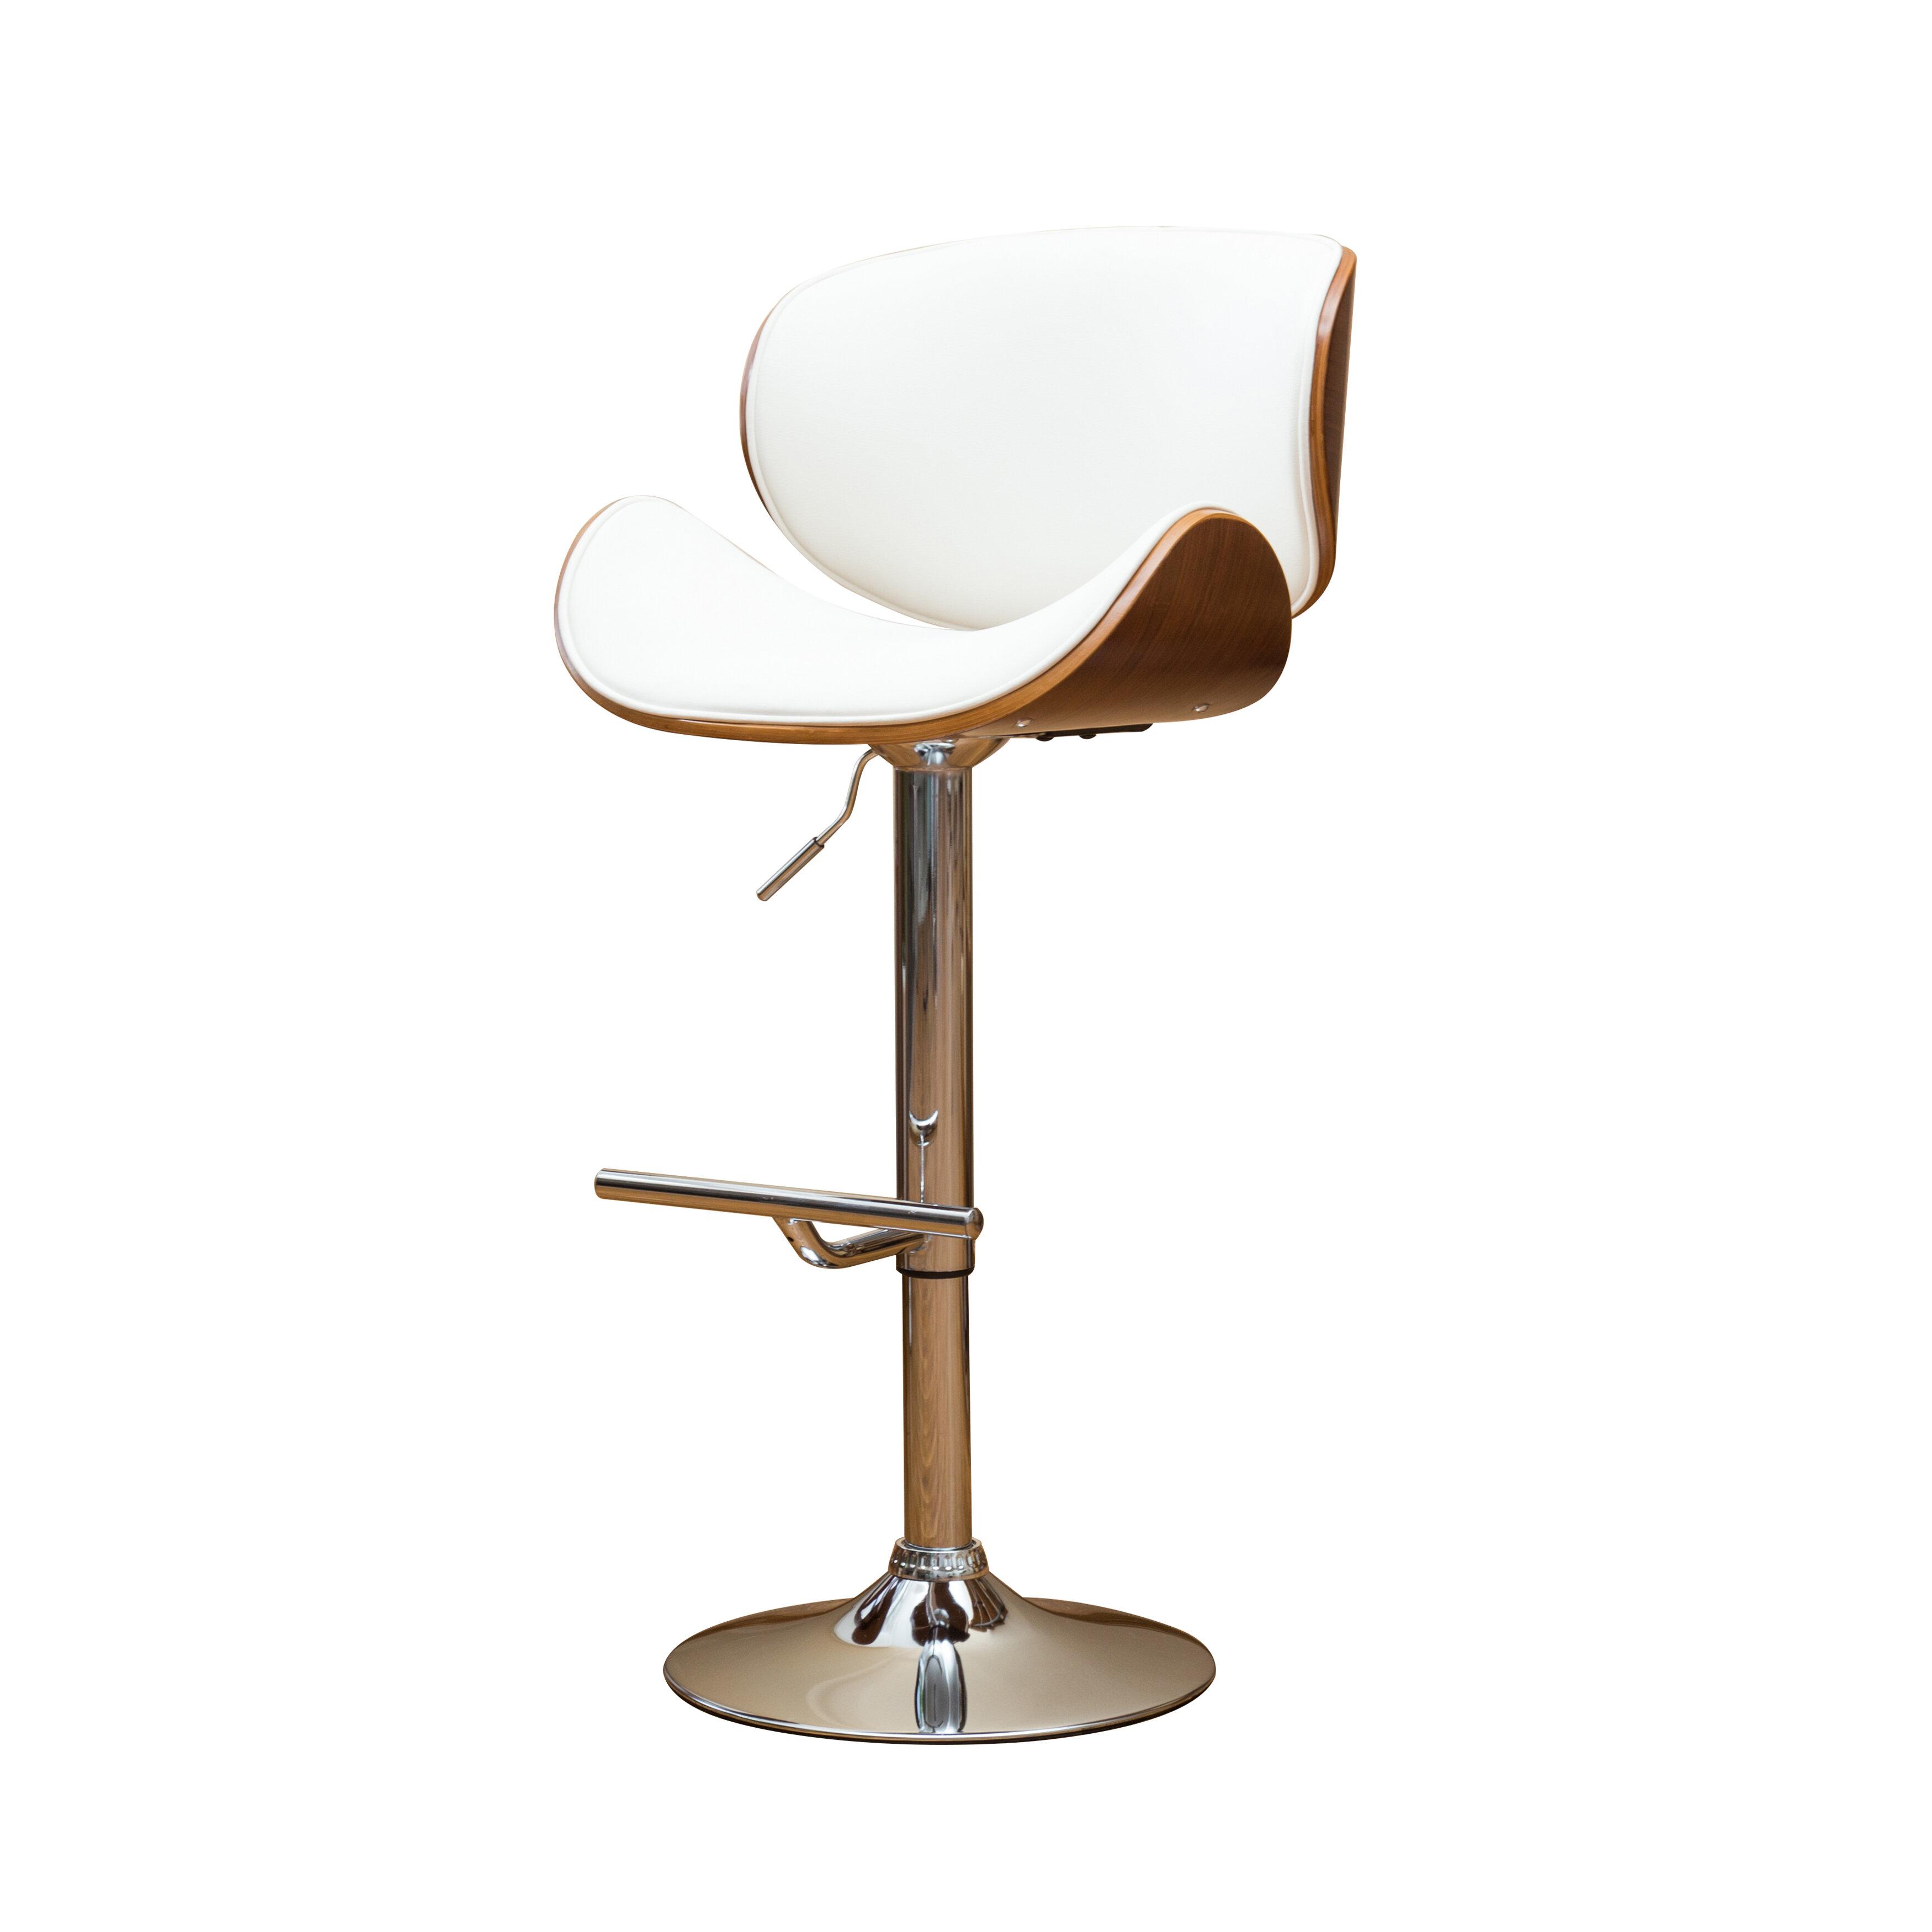 Peachy Bissett Adjustable Height Swivel Bar Stool Uwap Interior Chair Design Uwaporg